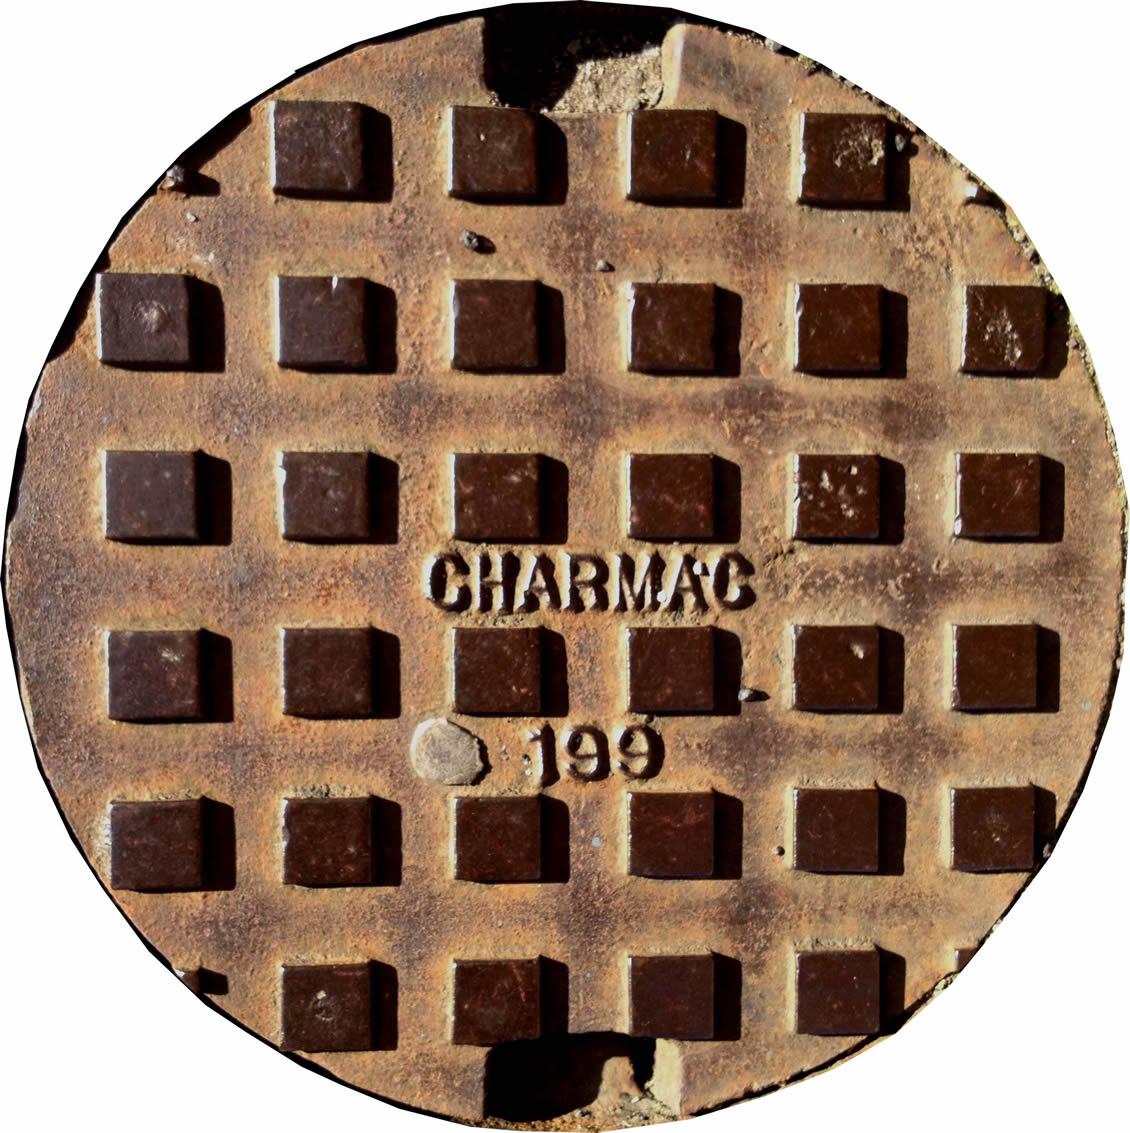 charmac2